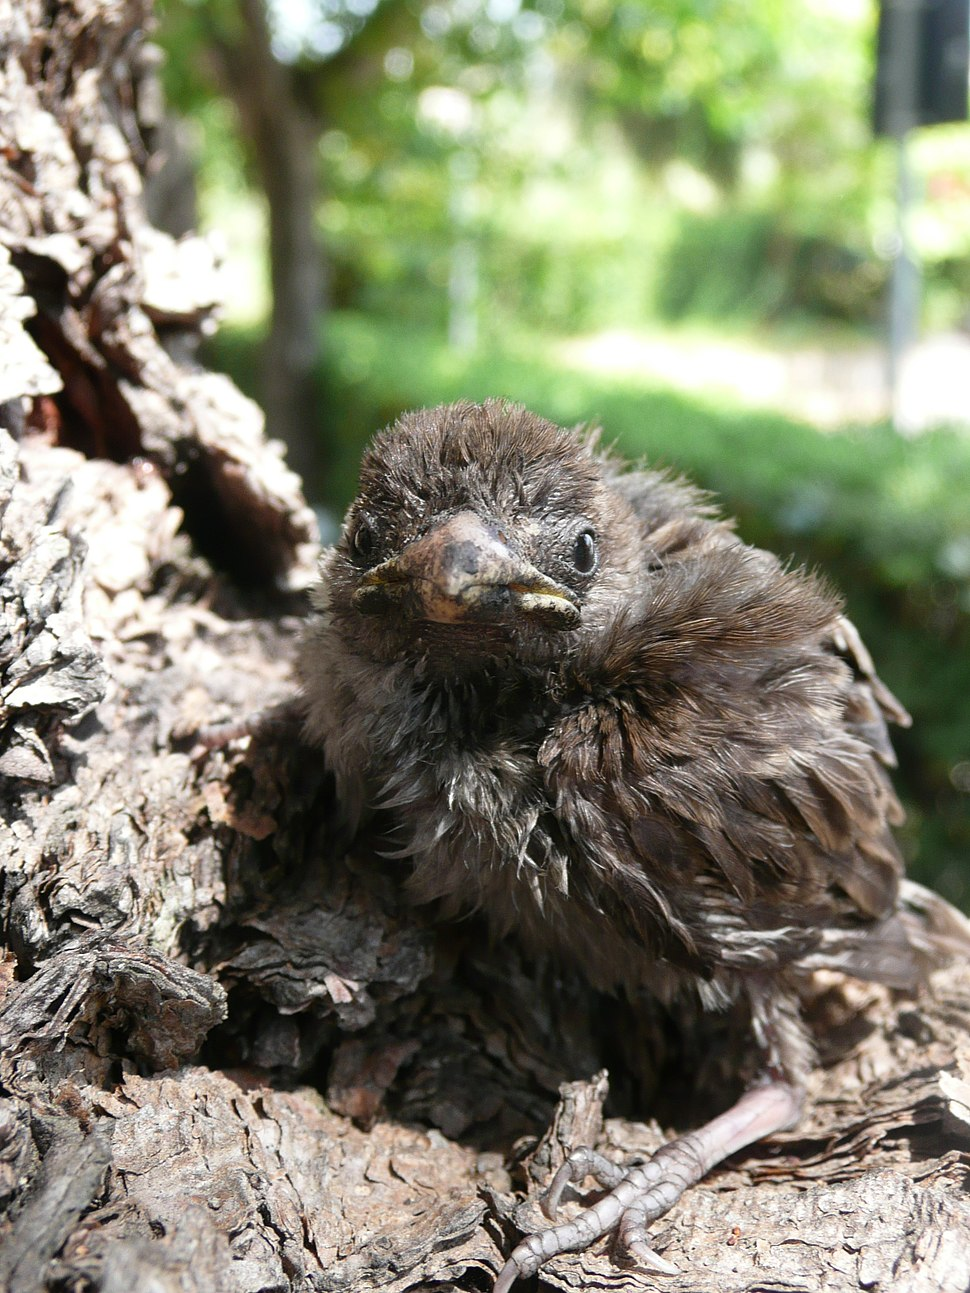 Sparrowchick